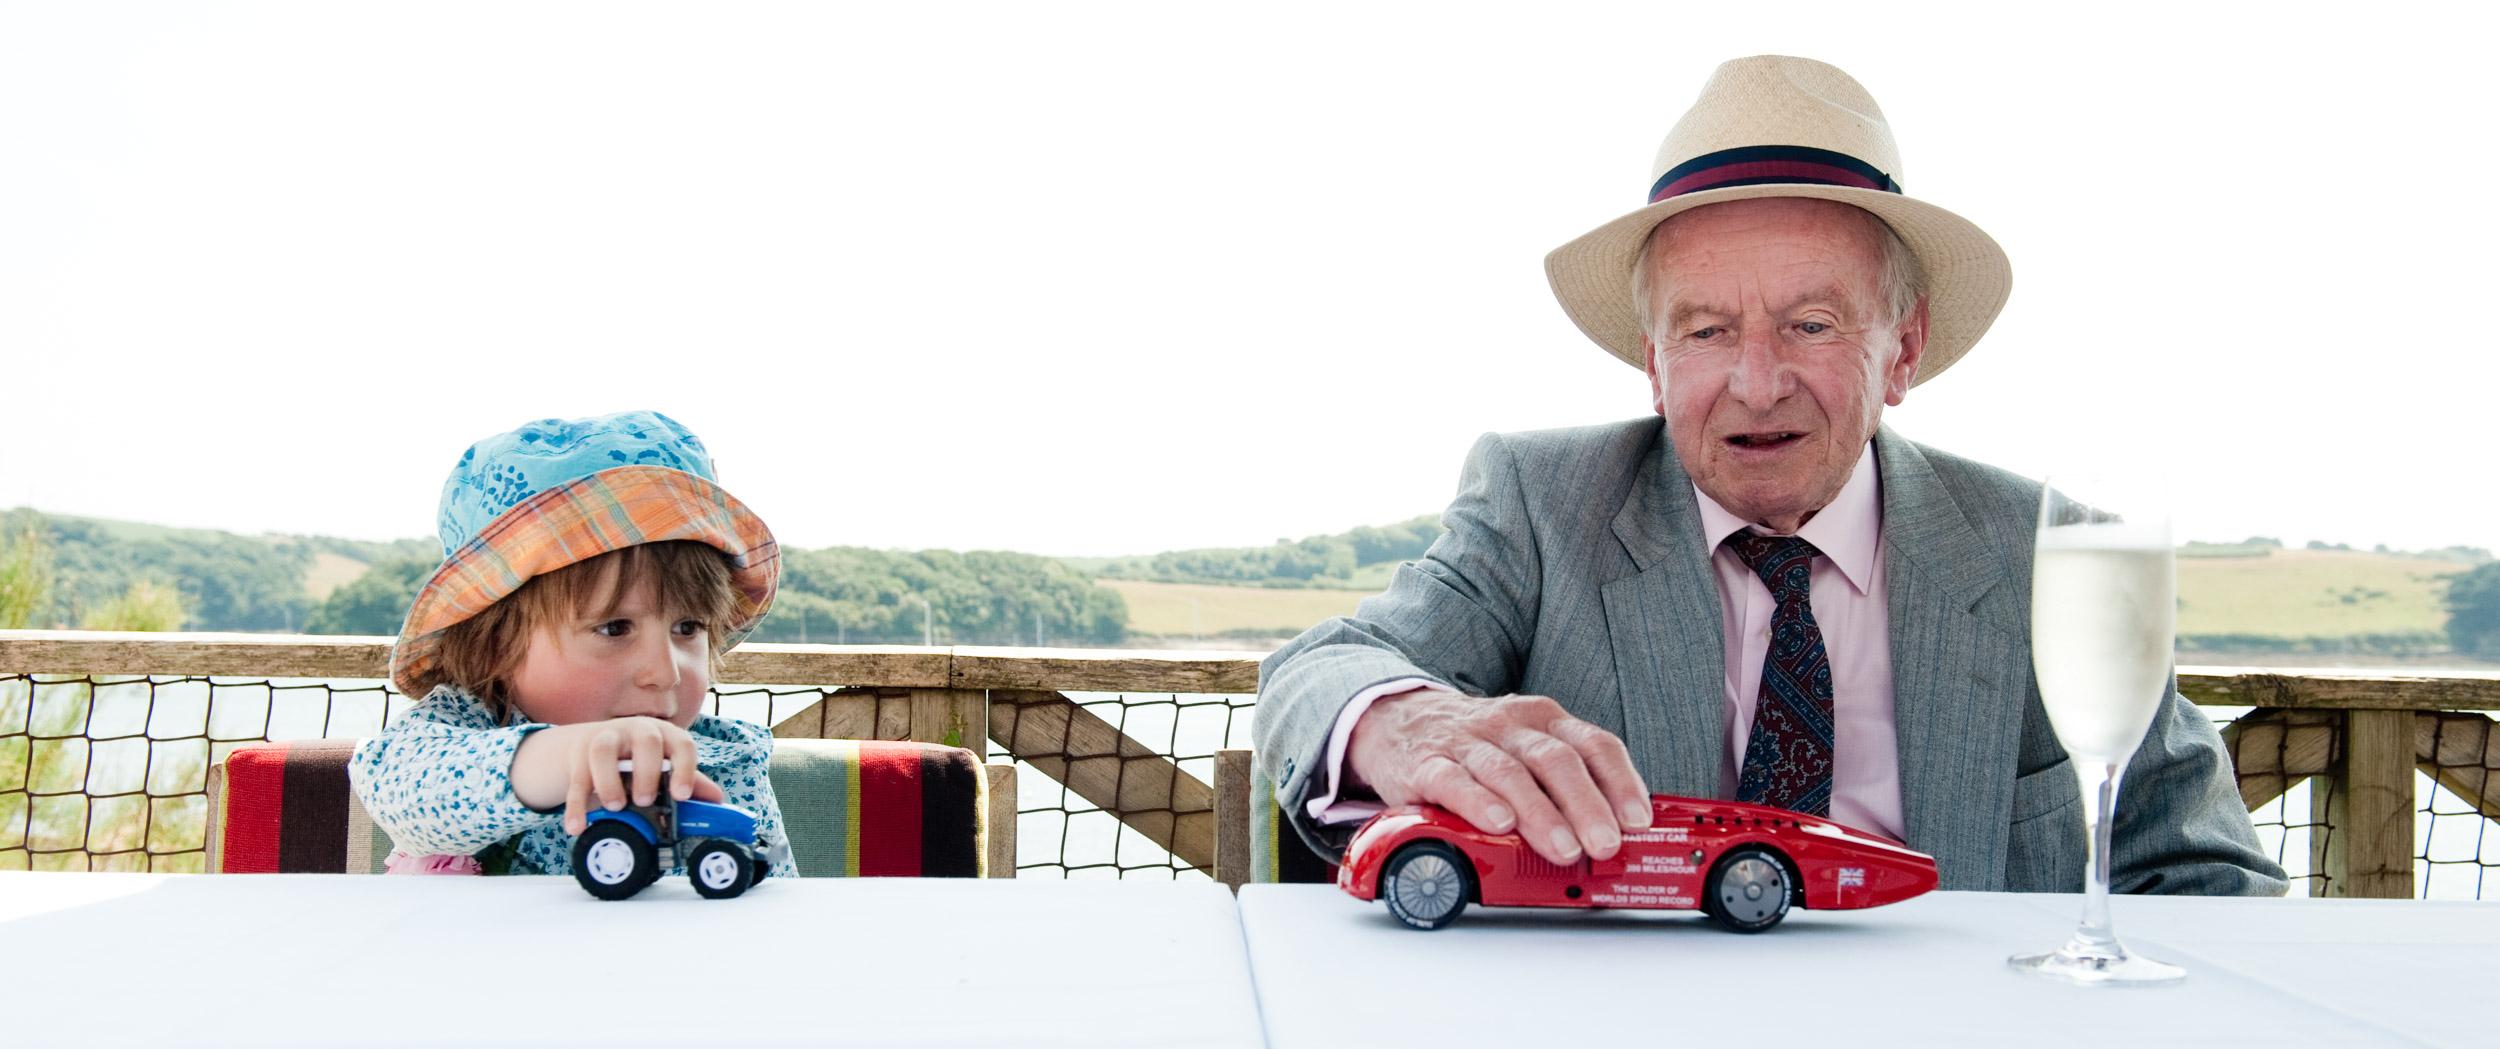 wedding-grandfather-1.jpg